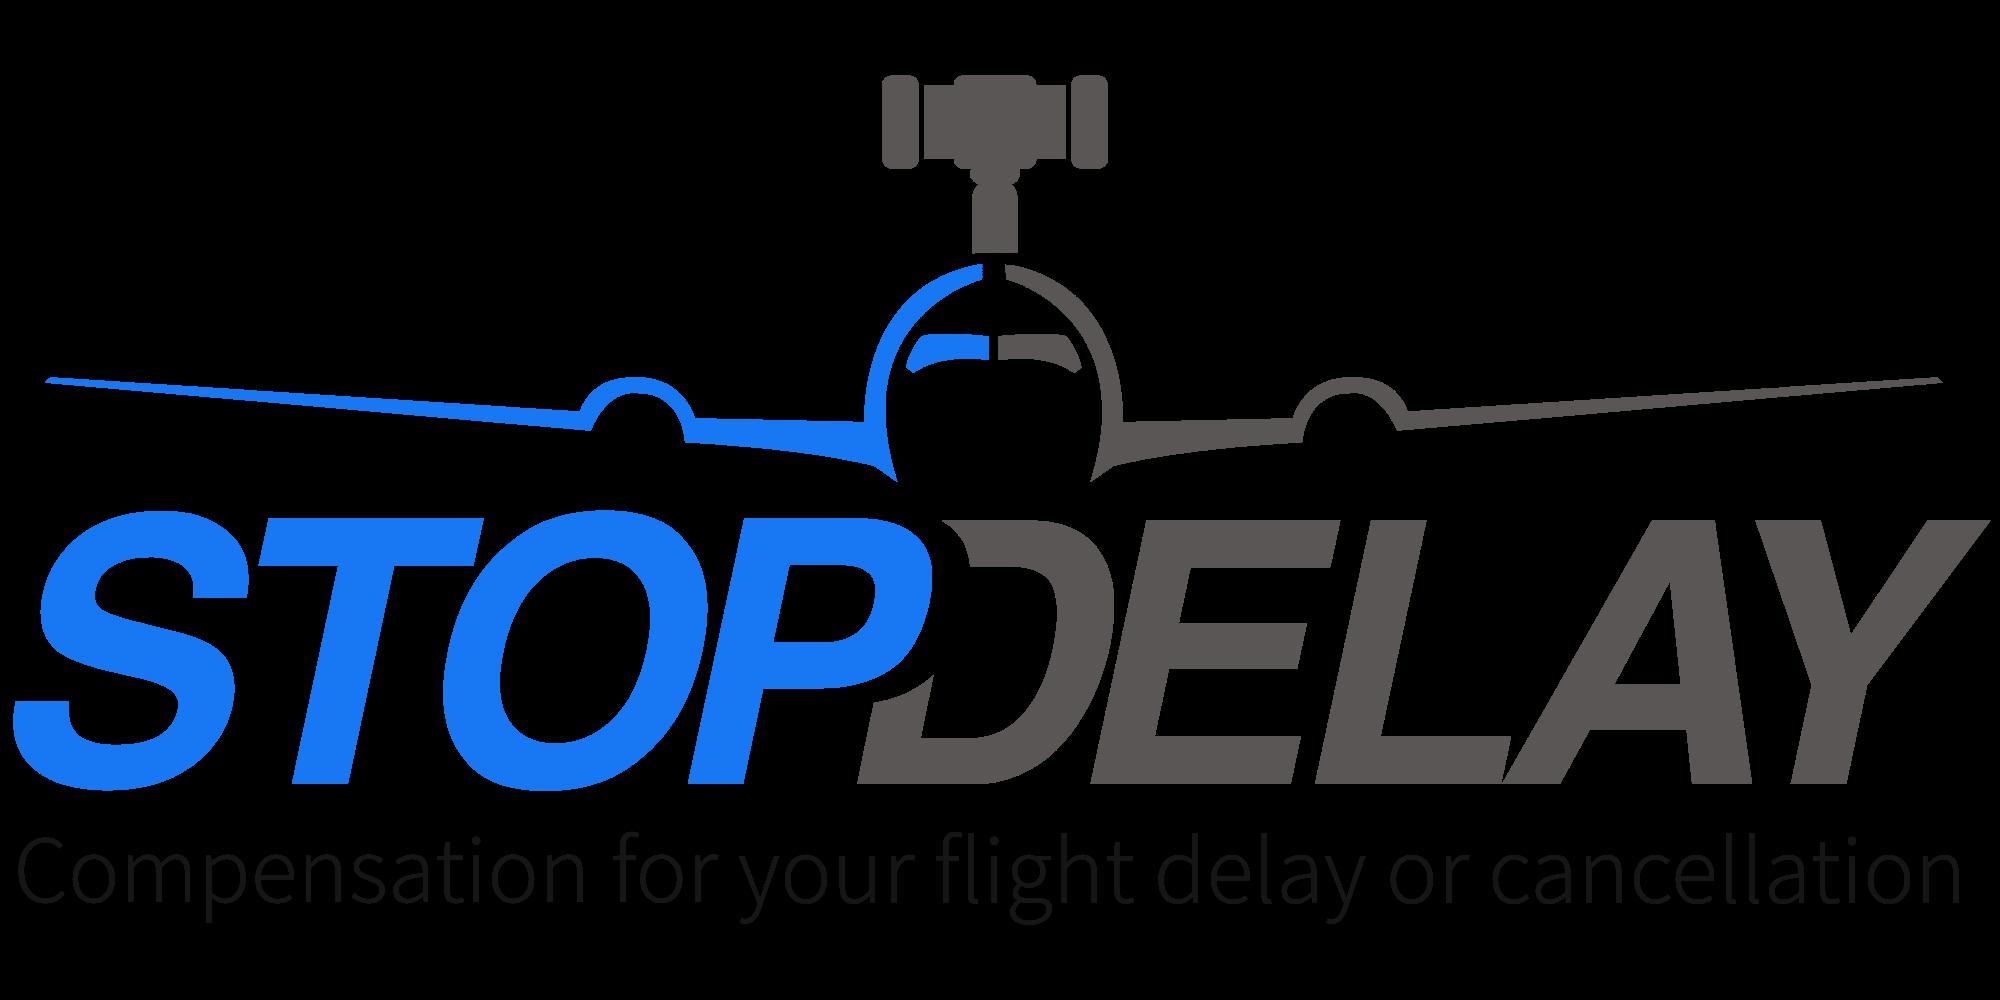 Stop Delay - פיצוי של כ-₪3080 מטיסה שבוטלה | טיסה שעוכבה | אוברבוקינג | מזוודה שאבדה | רישום יתר